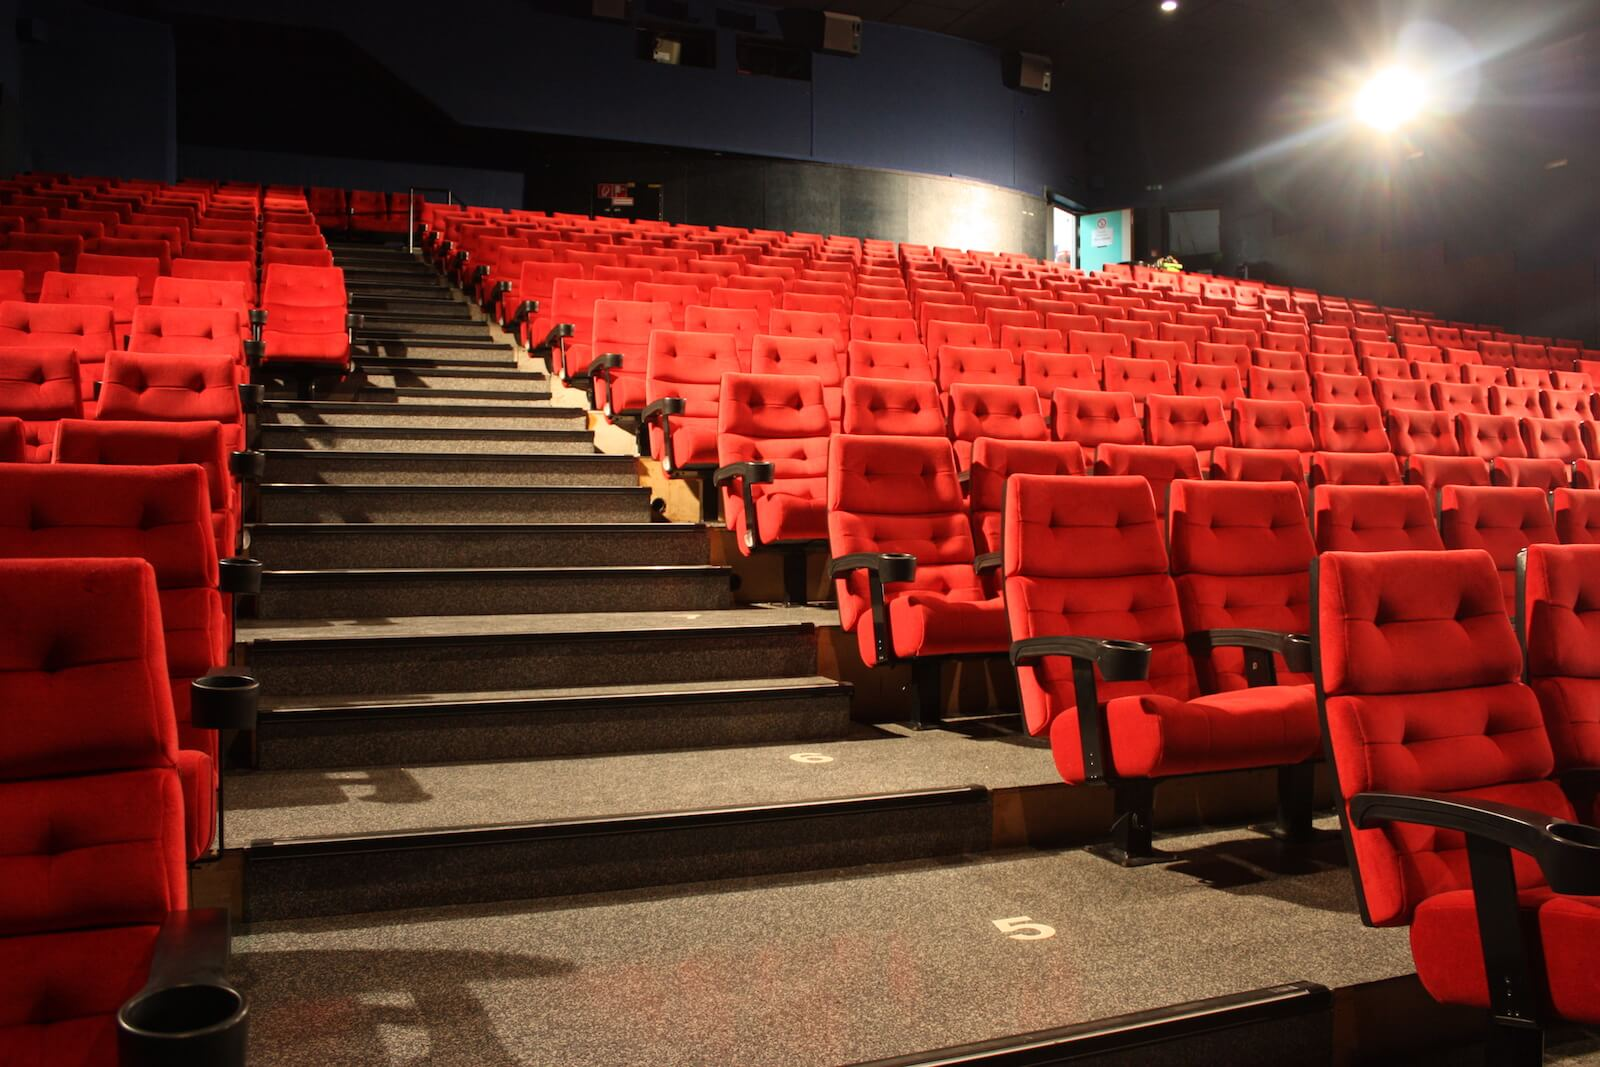 Full Size of Kino Mit Betten Metropol Studium In Innsbruck Singleküche E Geräten Küche Kochinsel Bett 200x200 Bettkasten Pantryküche Kühlschrank Massiv 2 Sitzer Sofa Wohnzimmer Kino Mit Betten